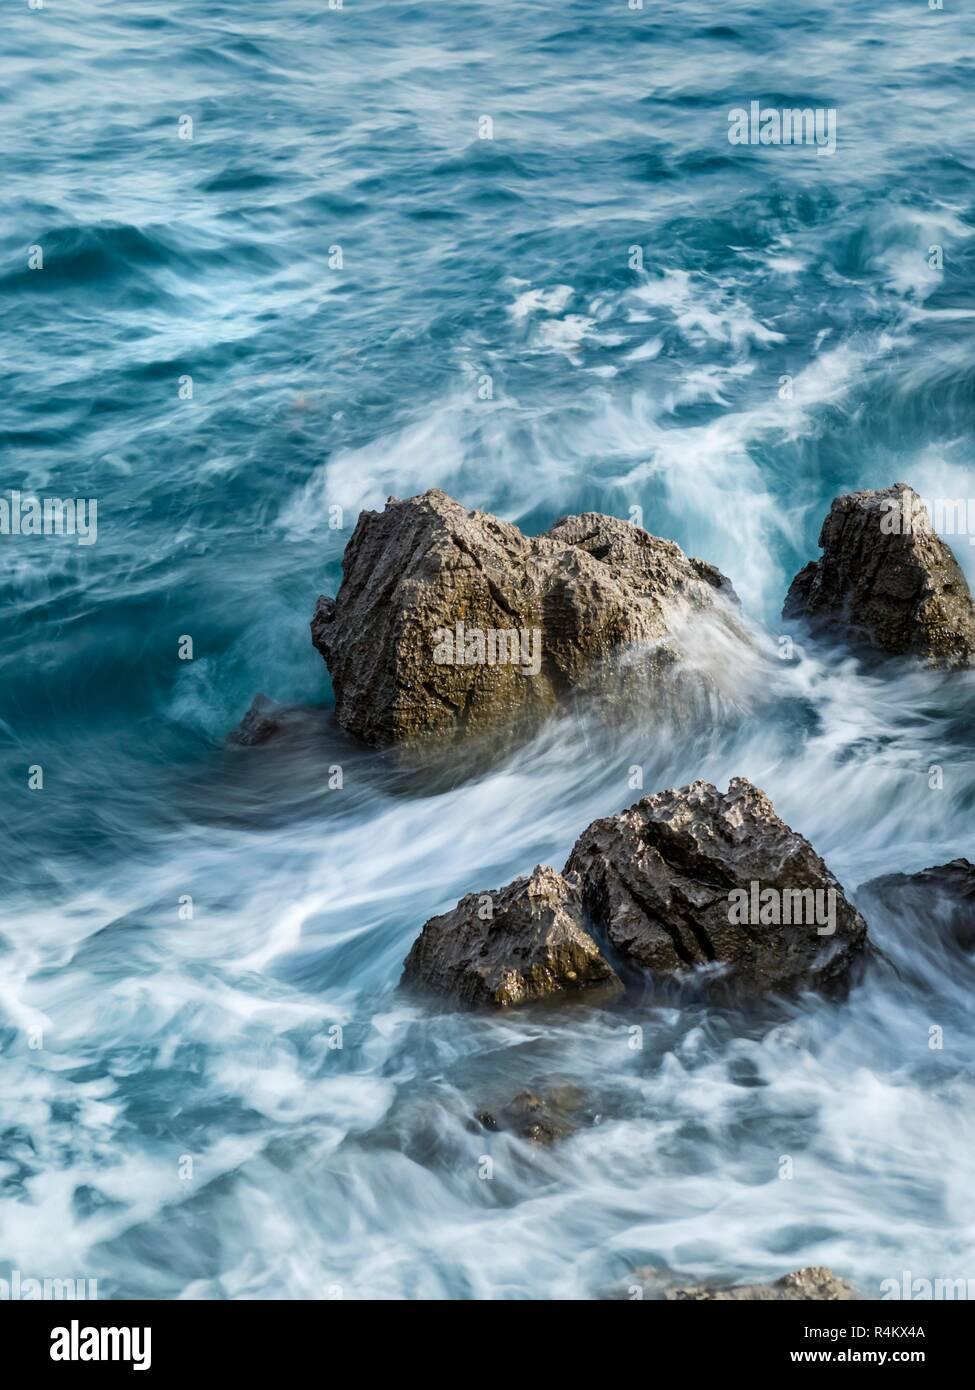 Sea turbulent waves atop rough rocky coastline - Stock Image